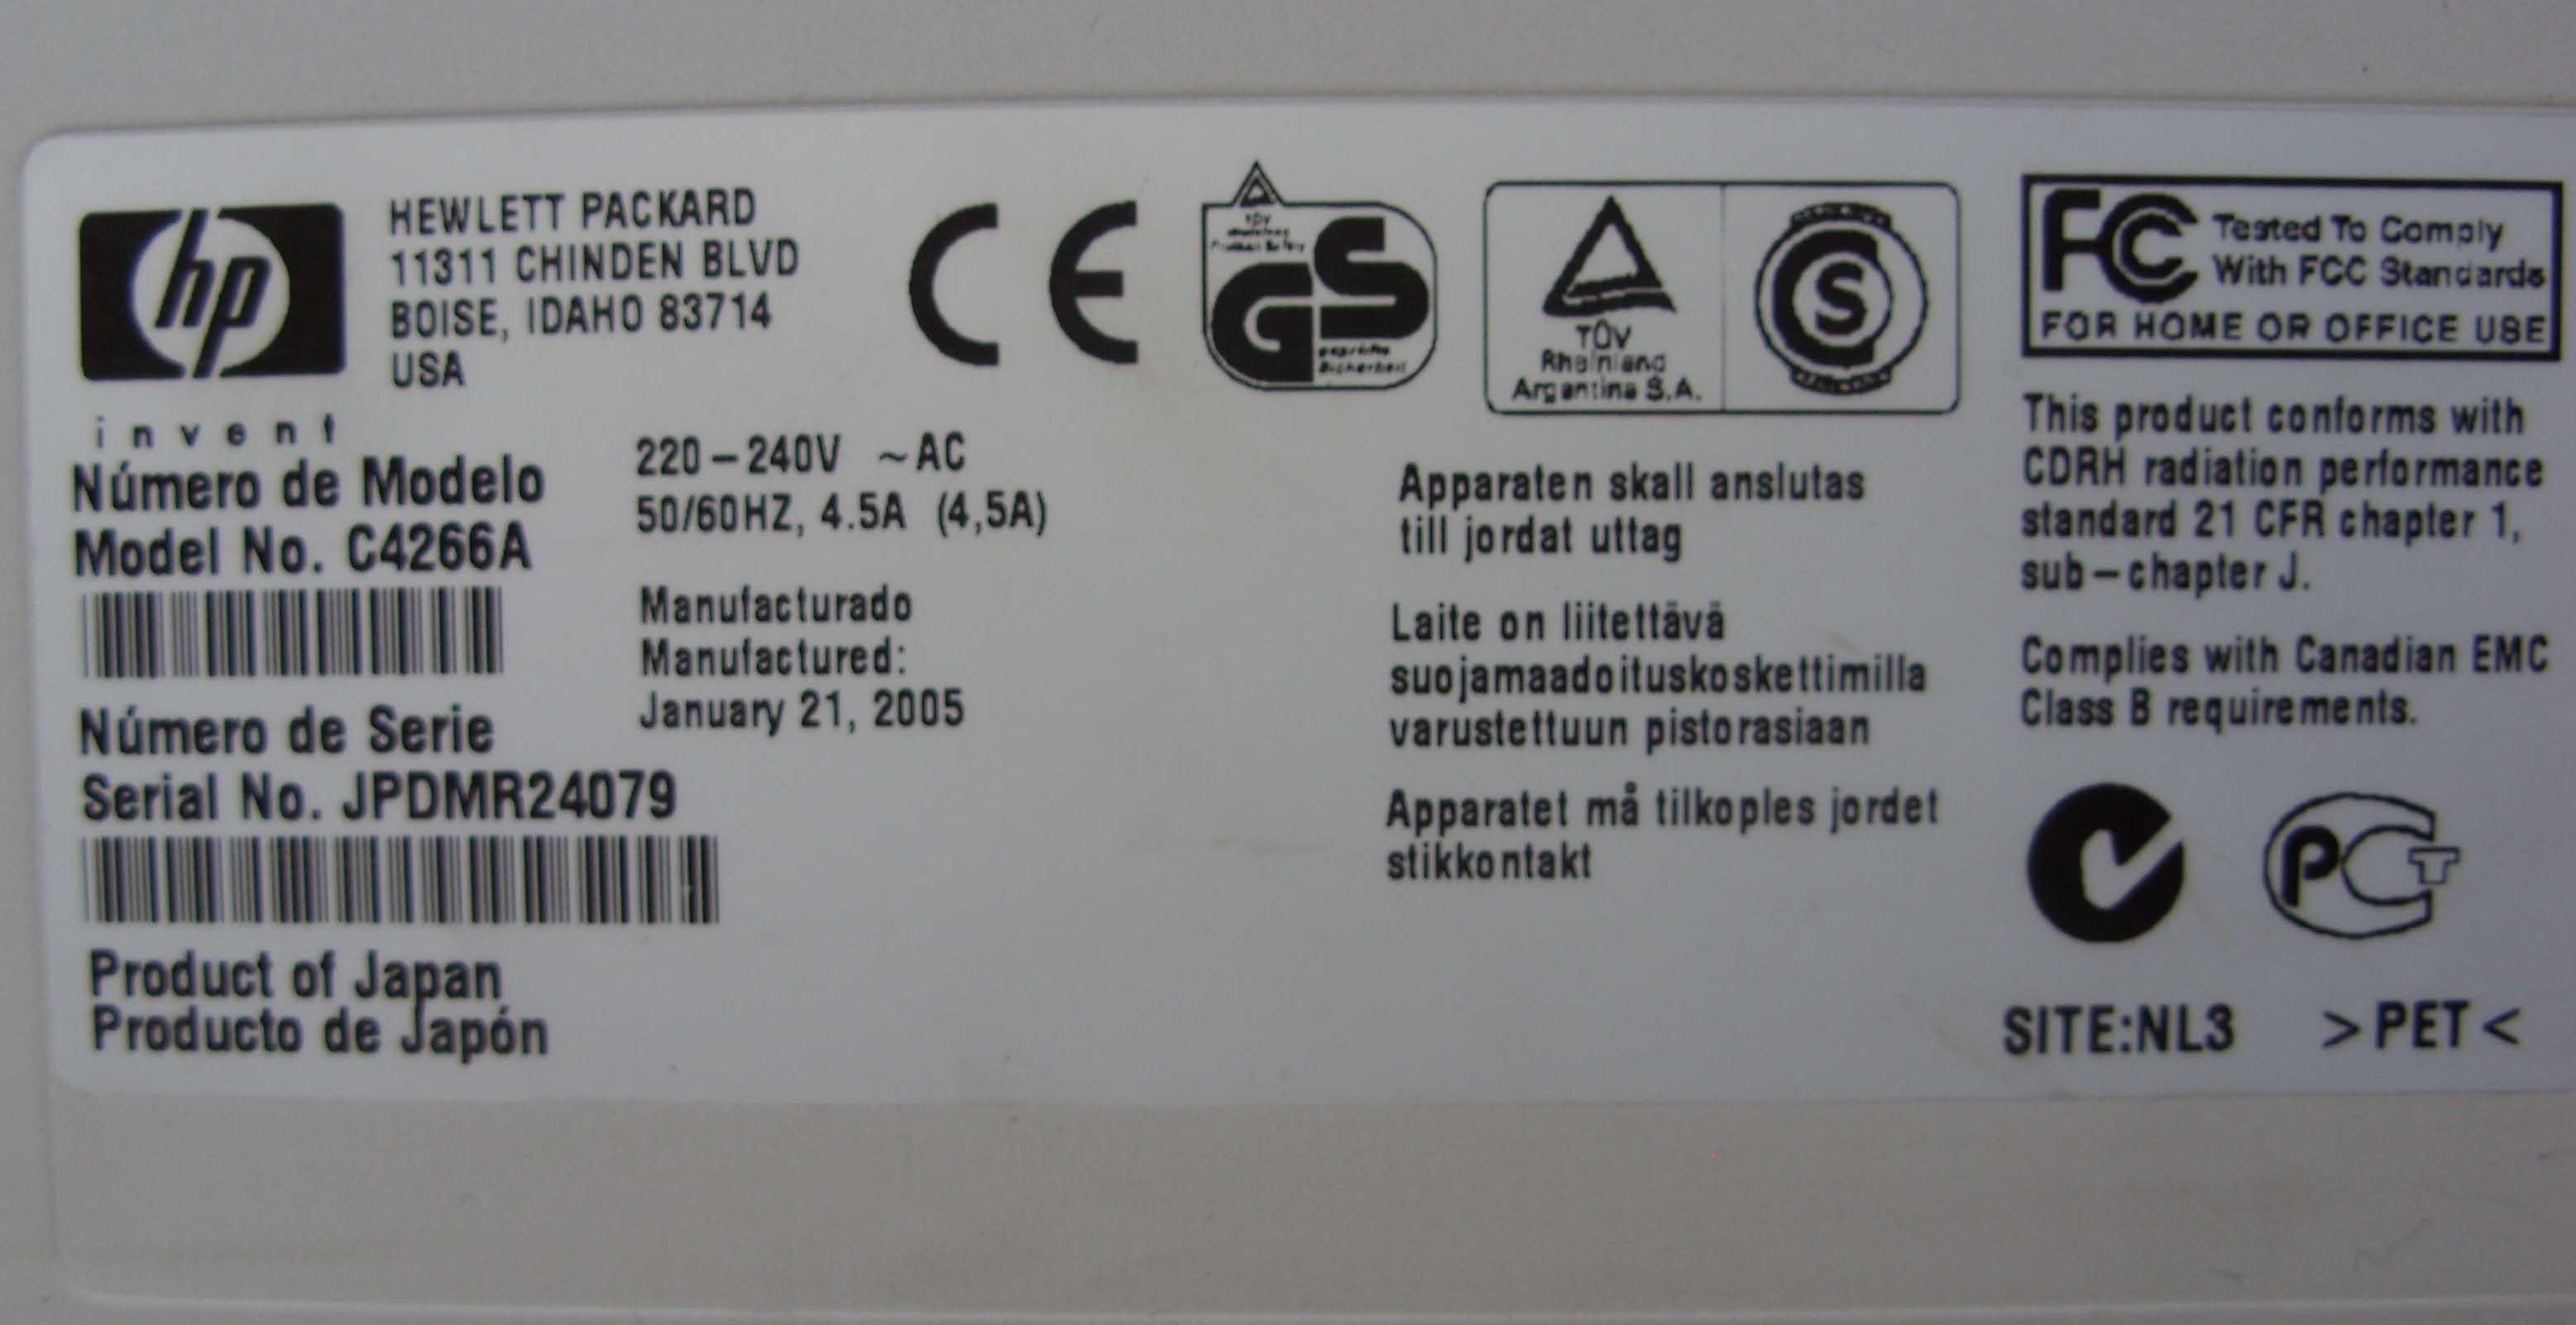 Hewlett Packard 3048h Скачать Драйвера (Rotule)